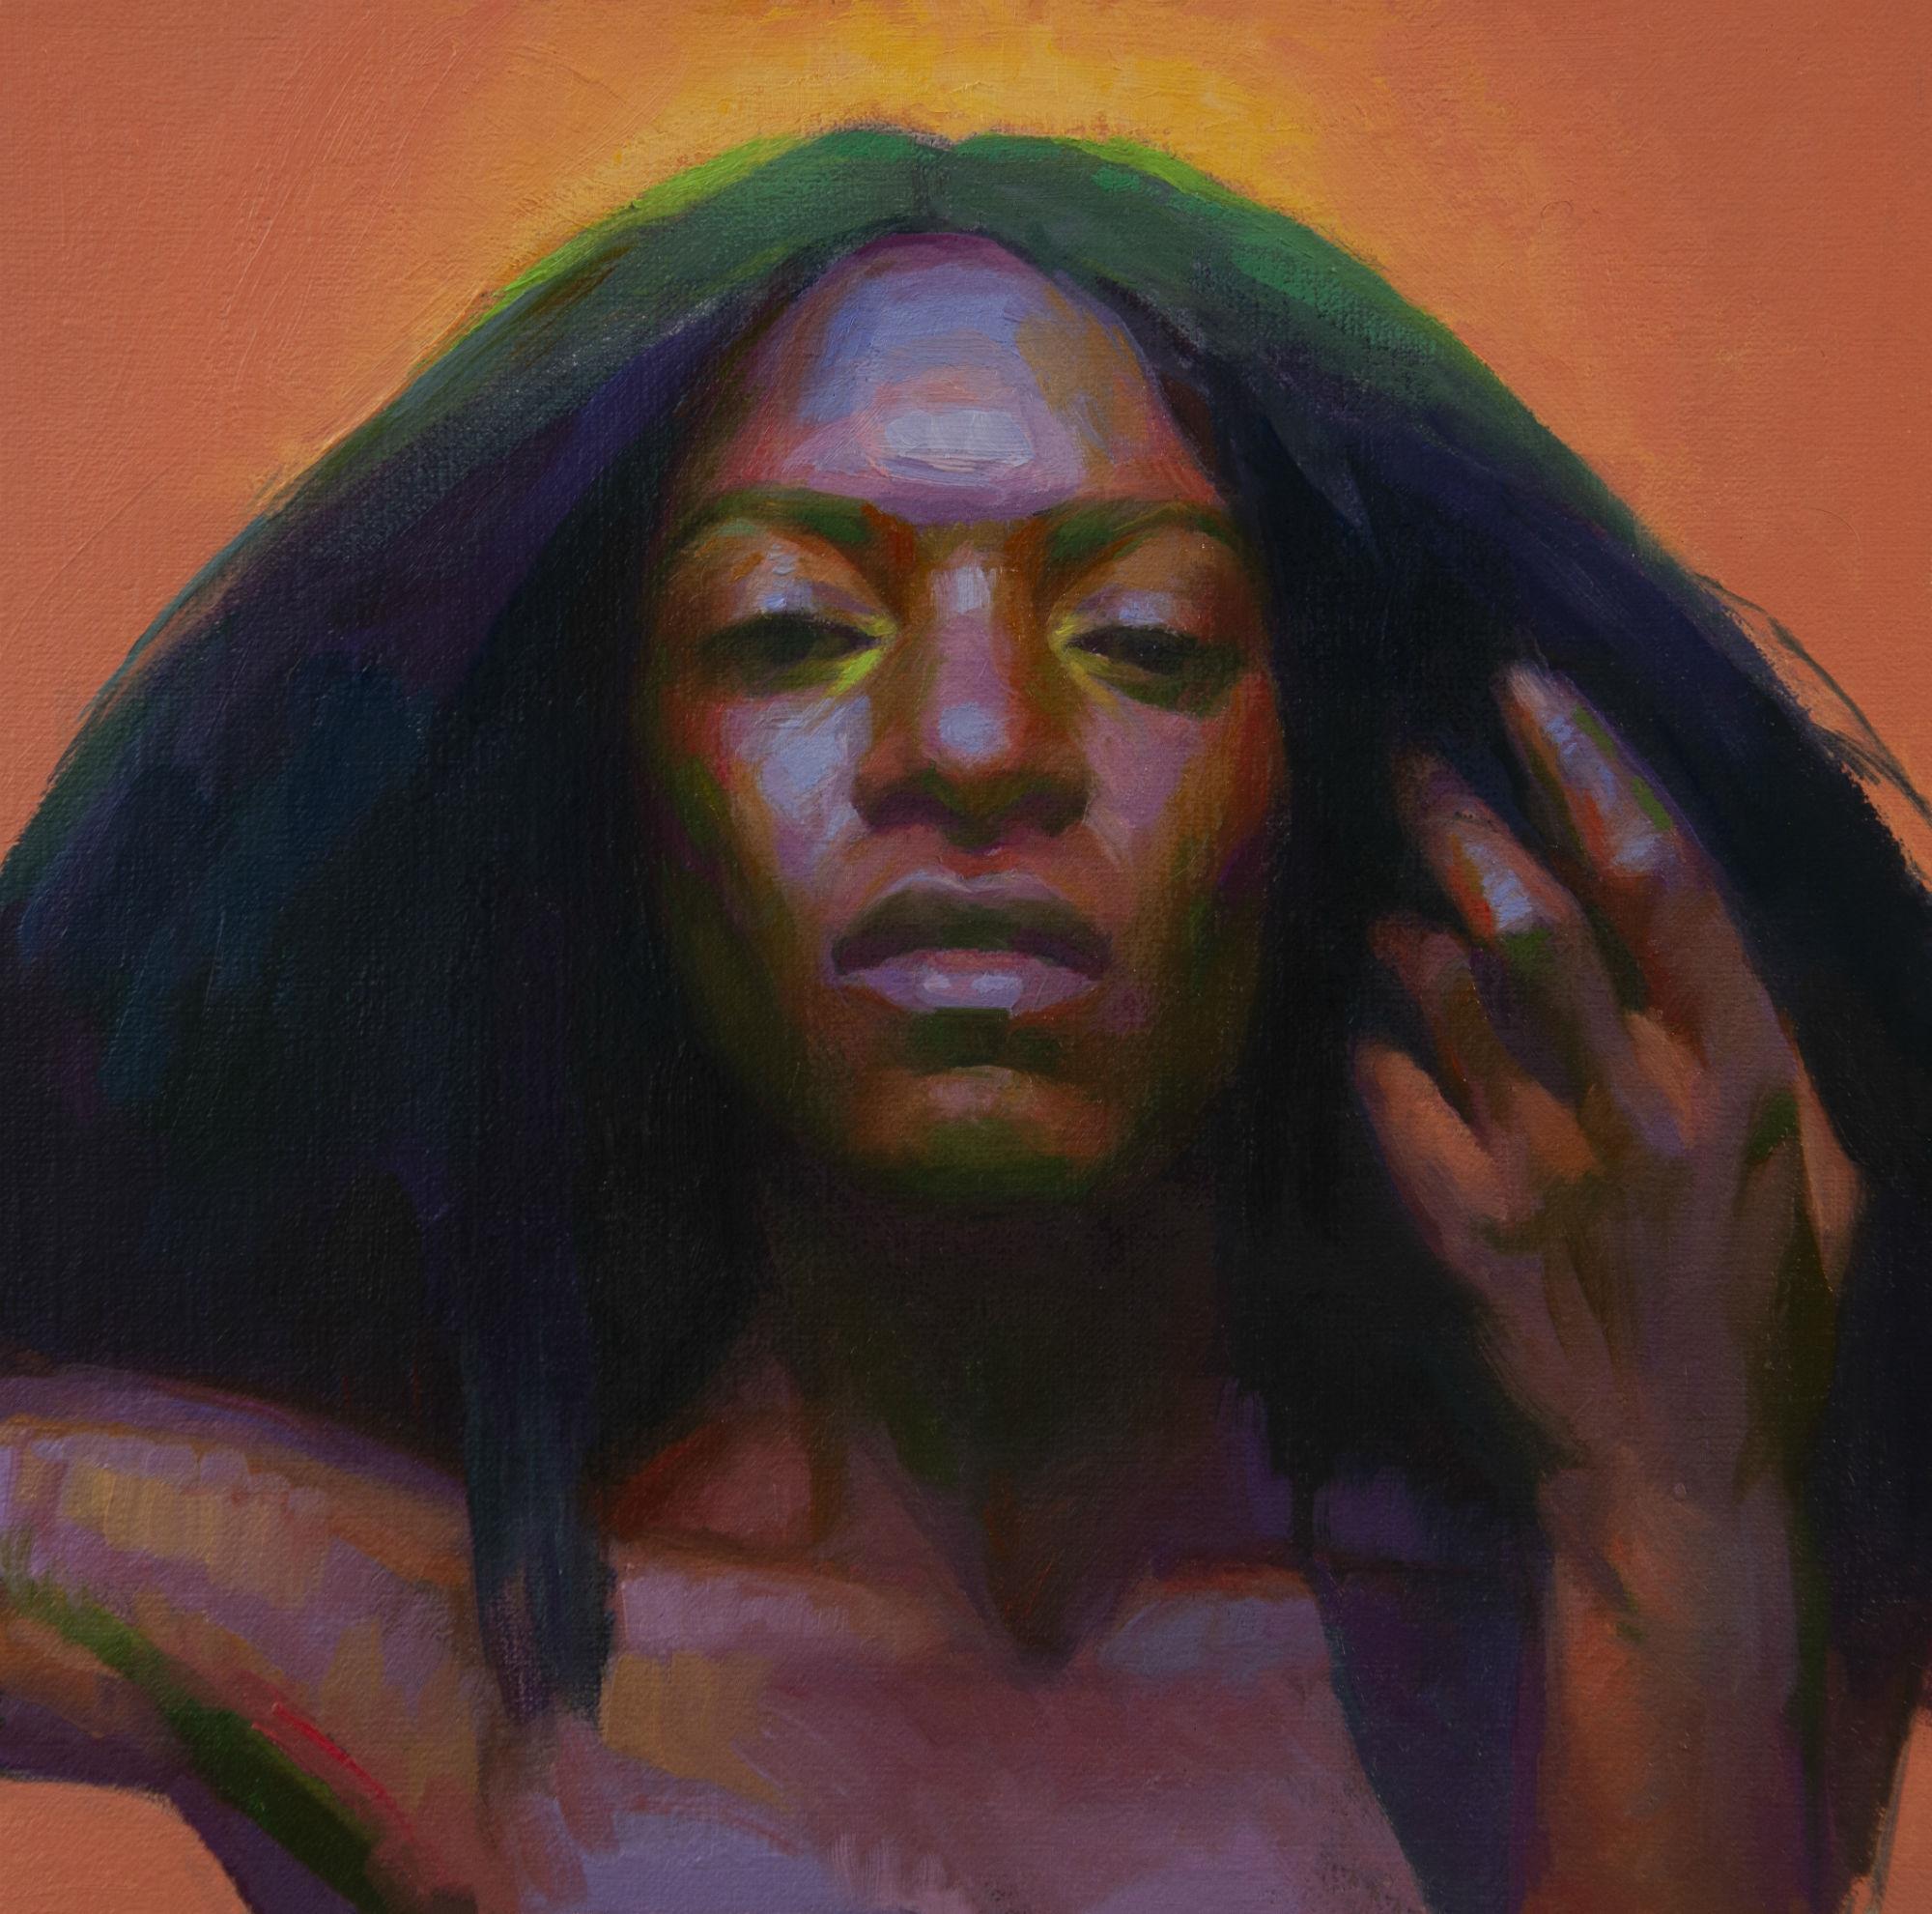 Nefertiti by Adrienne Stein